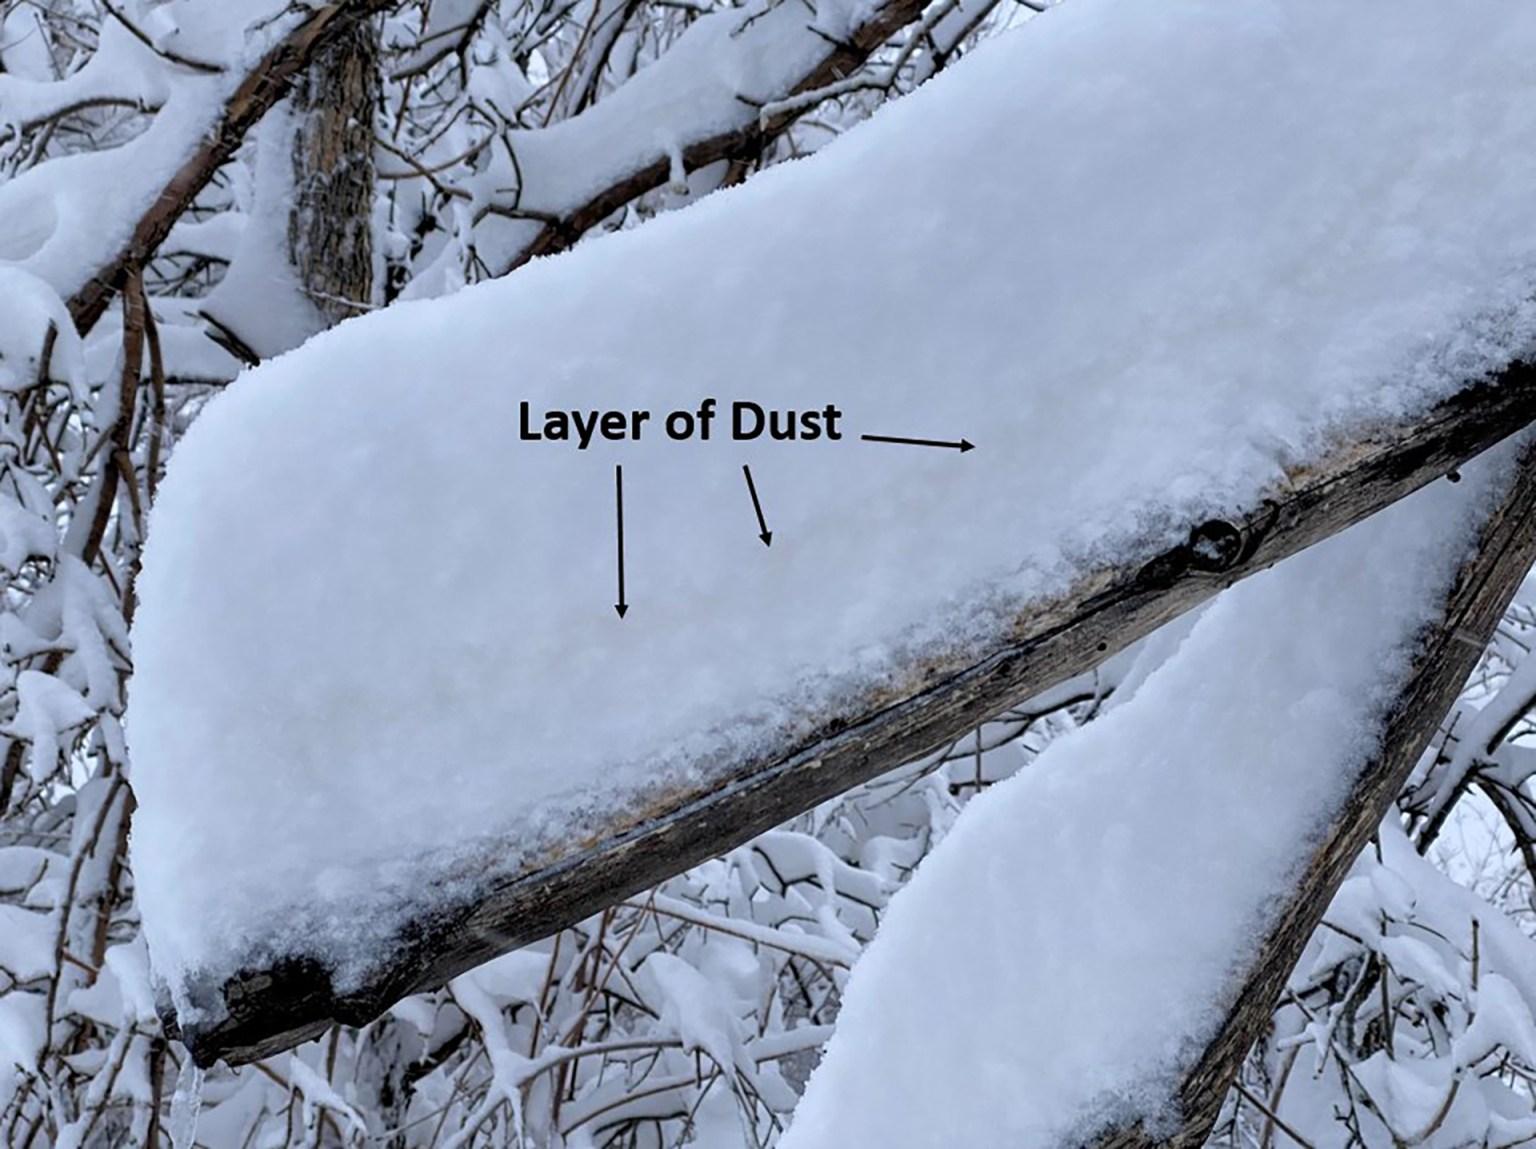 Mexican dust found in Colorado blizzard